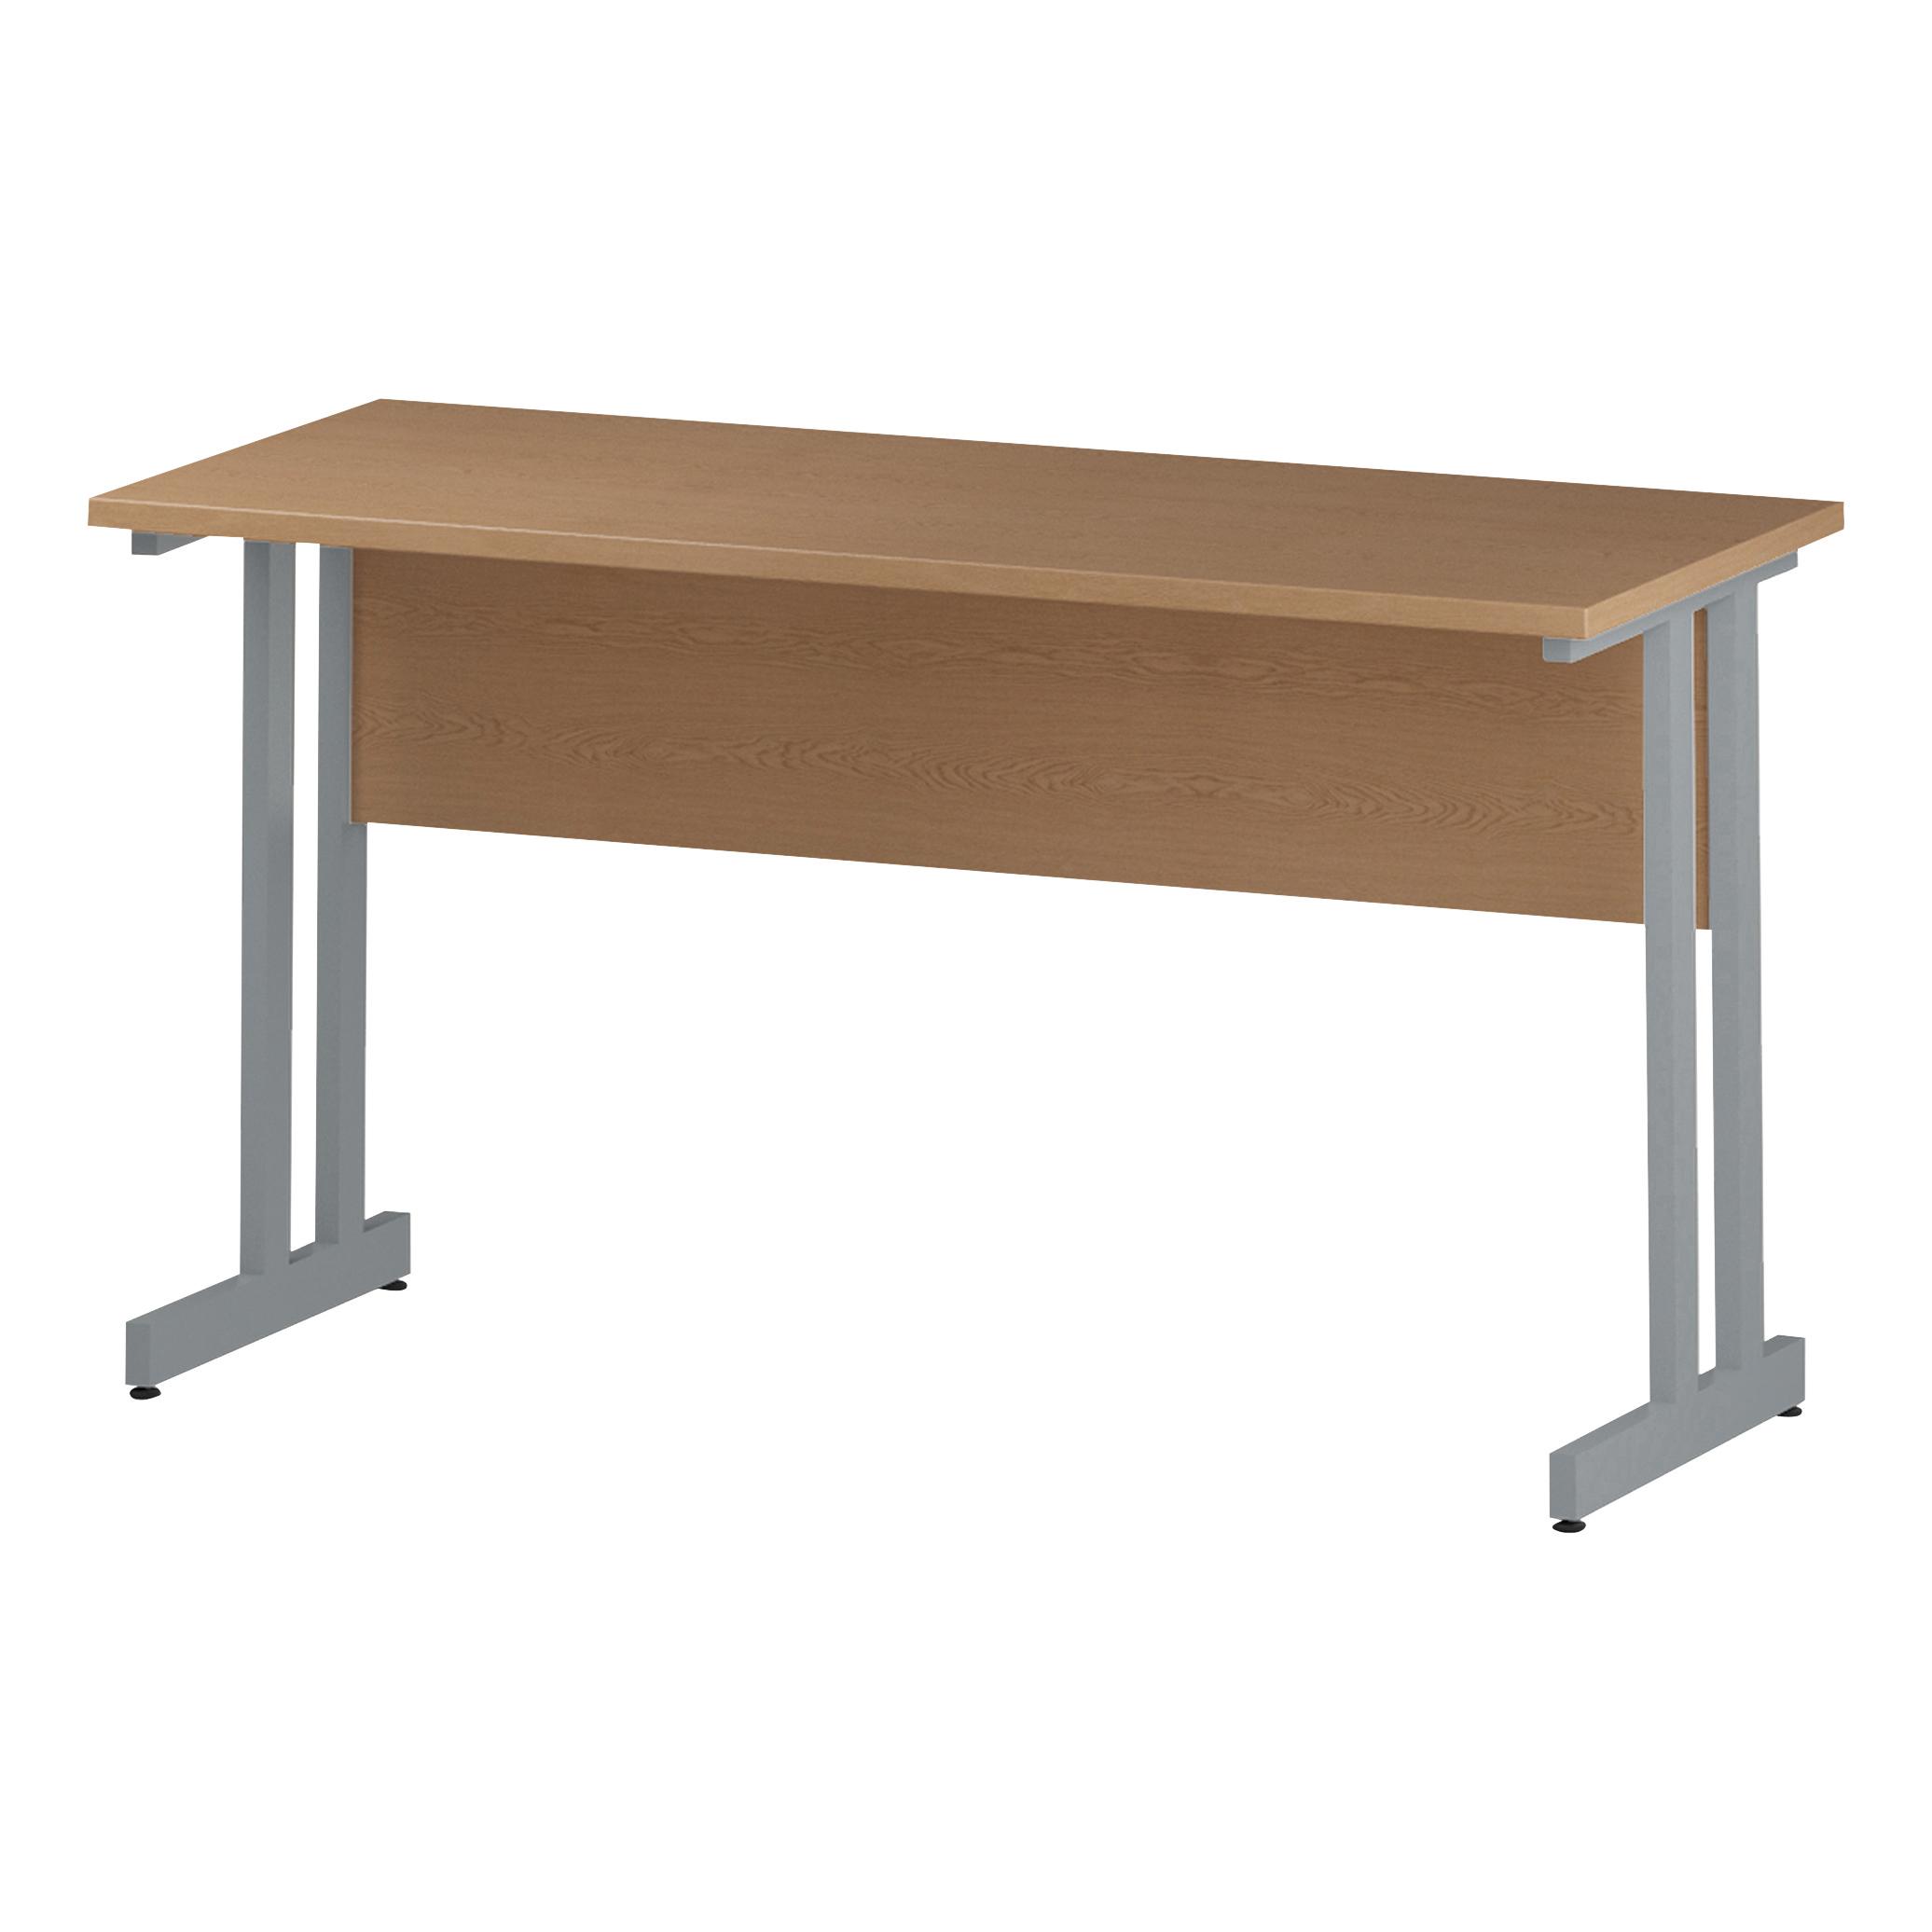 Trexus Rectangular Slim Desk Silver Cantilever Leg 1400x600mm Oak Ref I002649